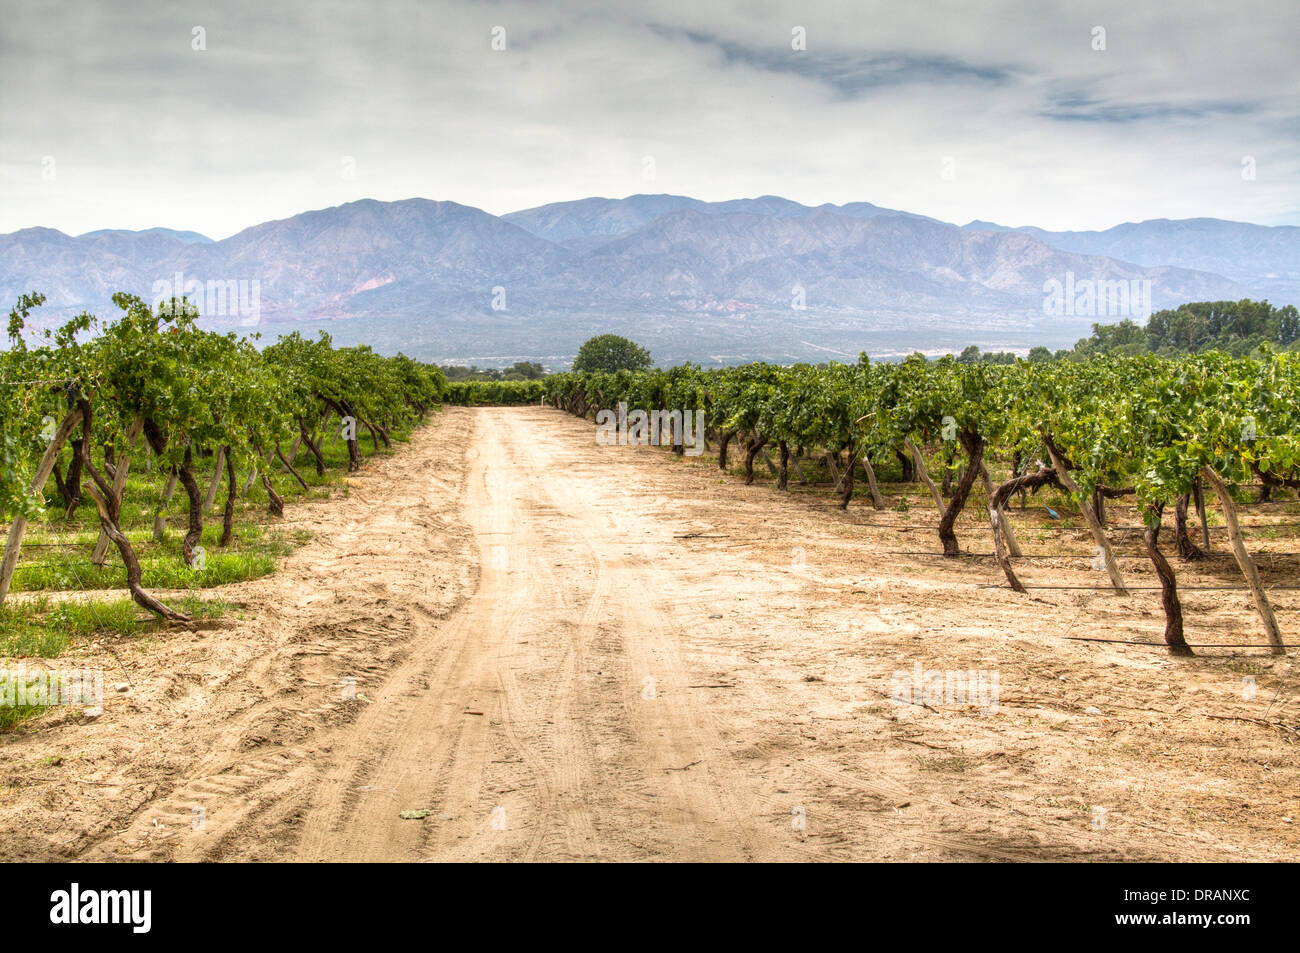 Vine yards in Cafayate - Stock Image